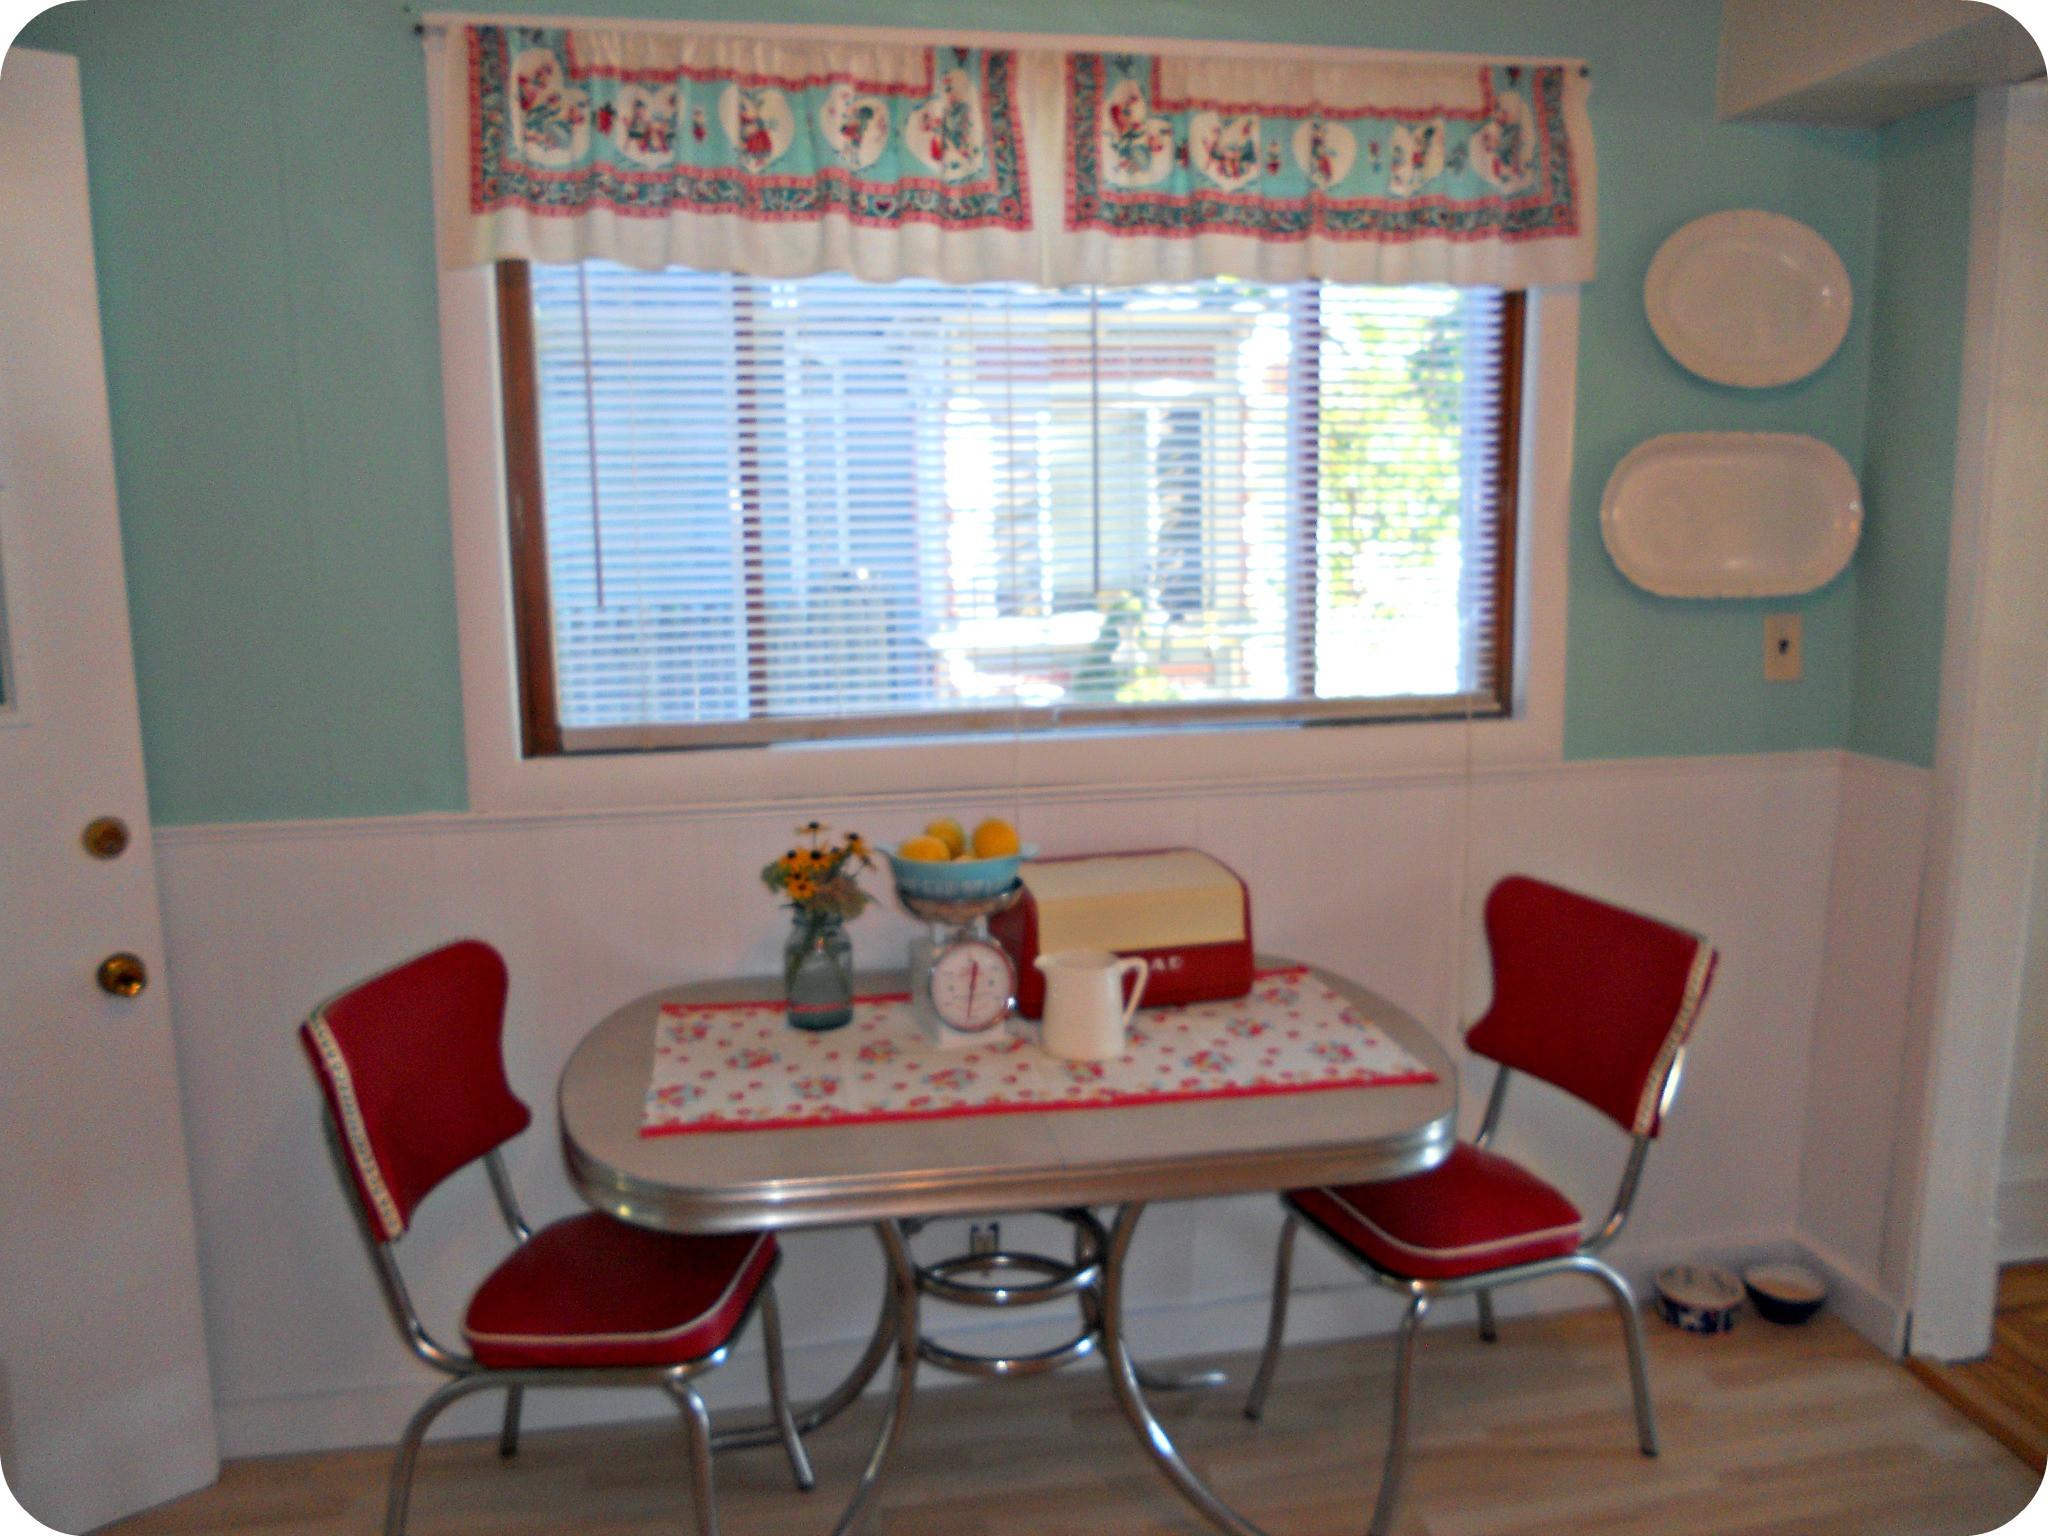 Best ideas about Antique Kitchen Decor . Save or Pin vintage kitchen decor Cornbread & Beans Quilting and Decor Now.